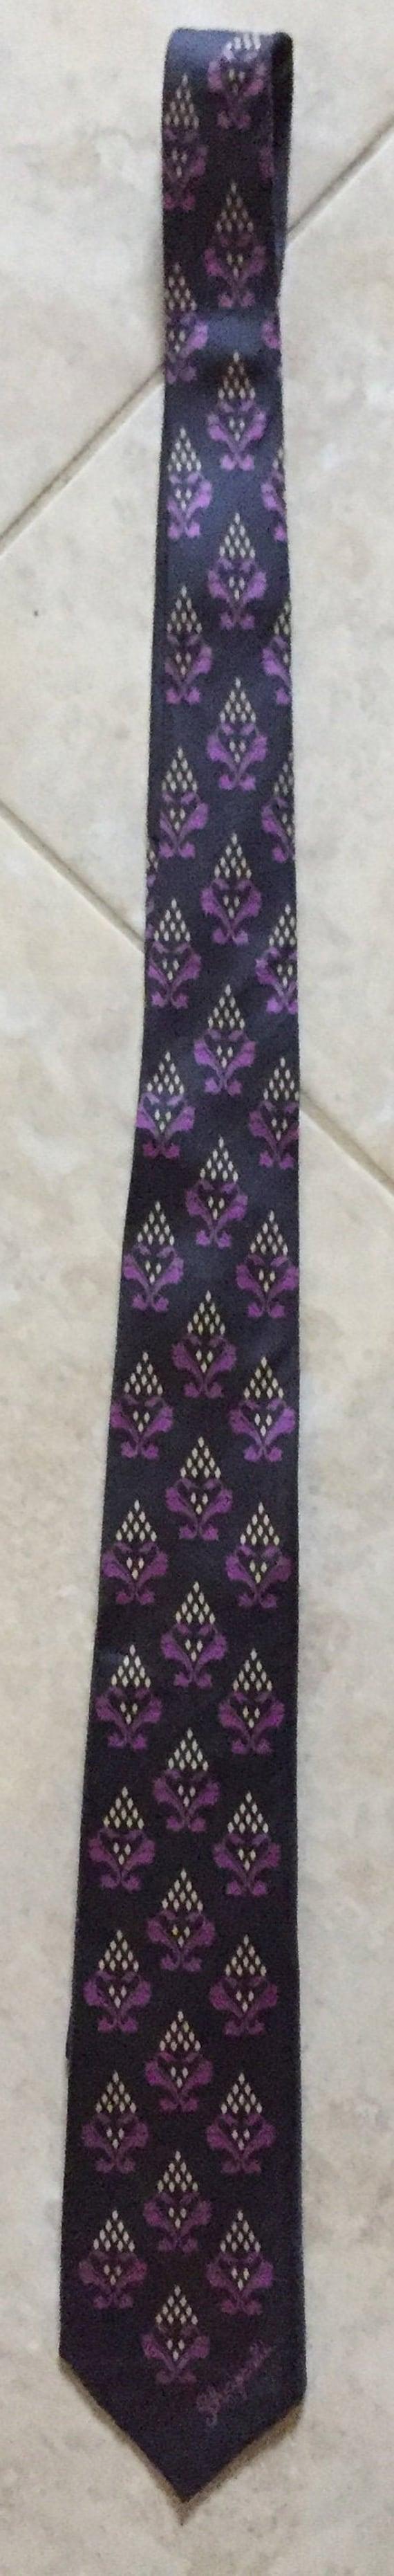 Rare Vintage 1950s Schiaparelli Necktie